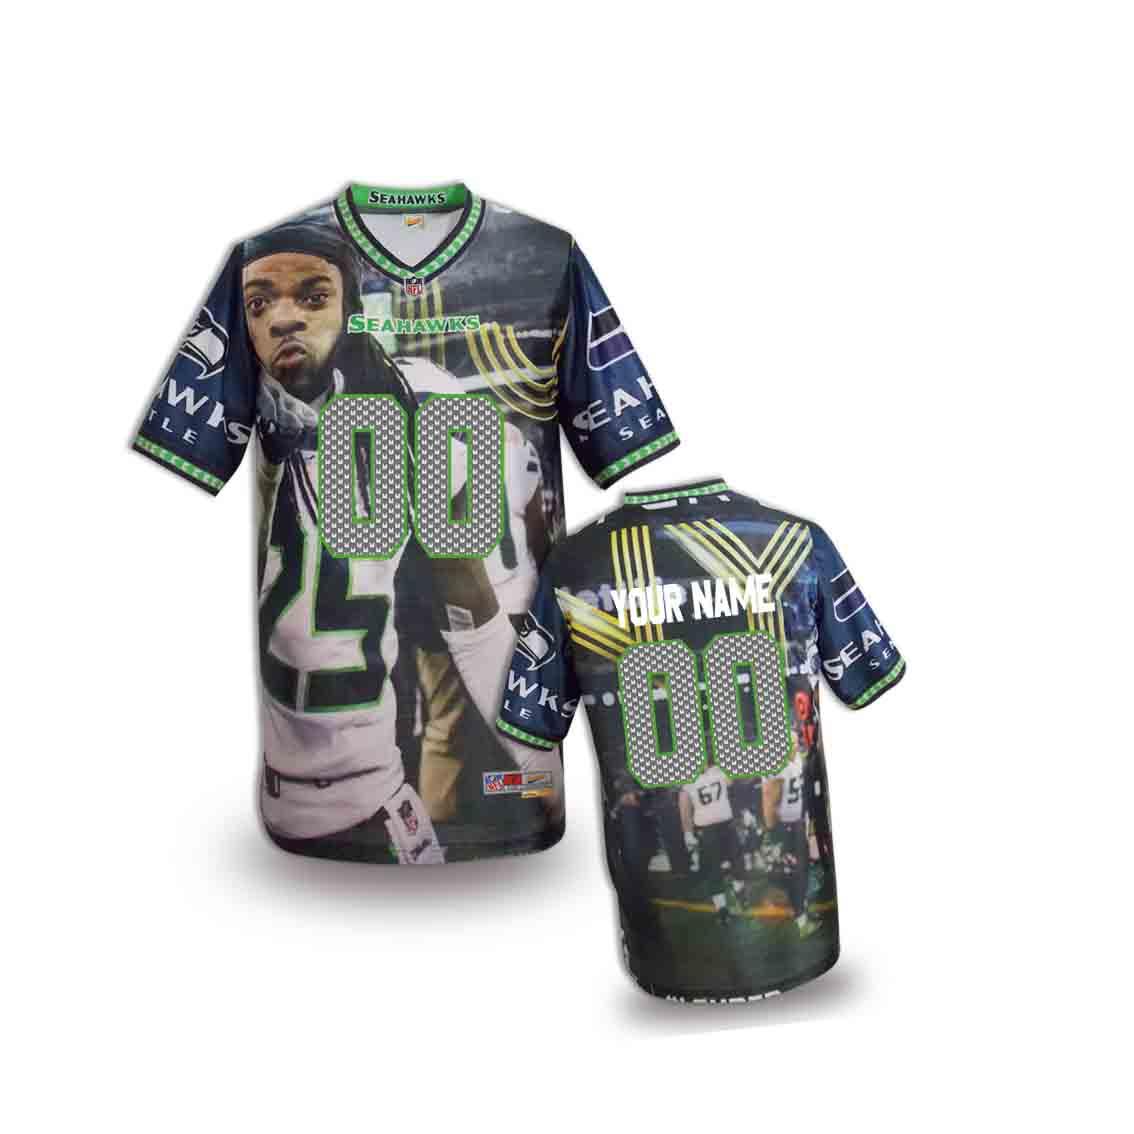 Nike Seahawks Customized Fashion Stitched Youth Jerseys04